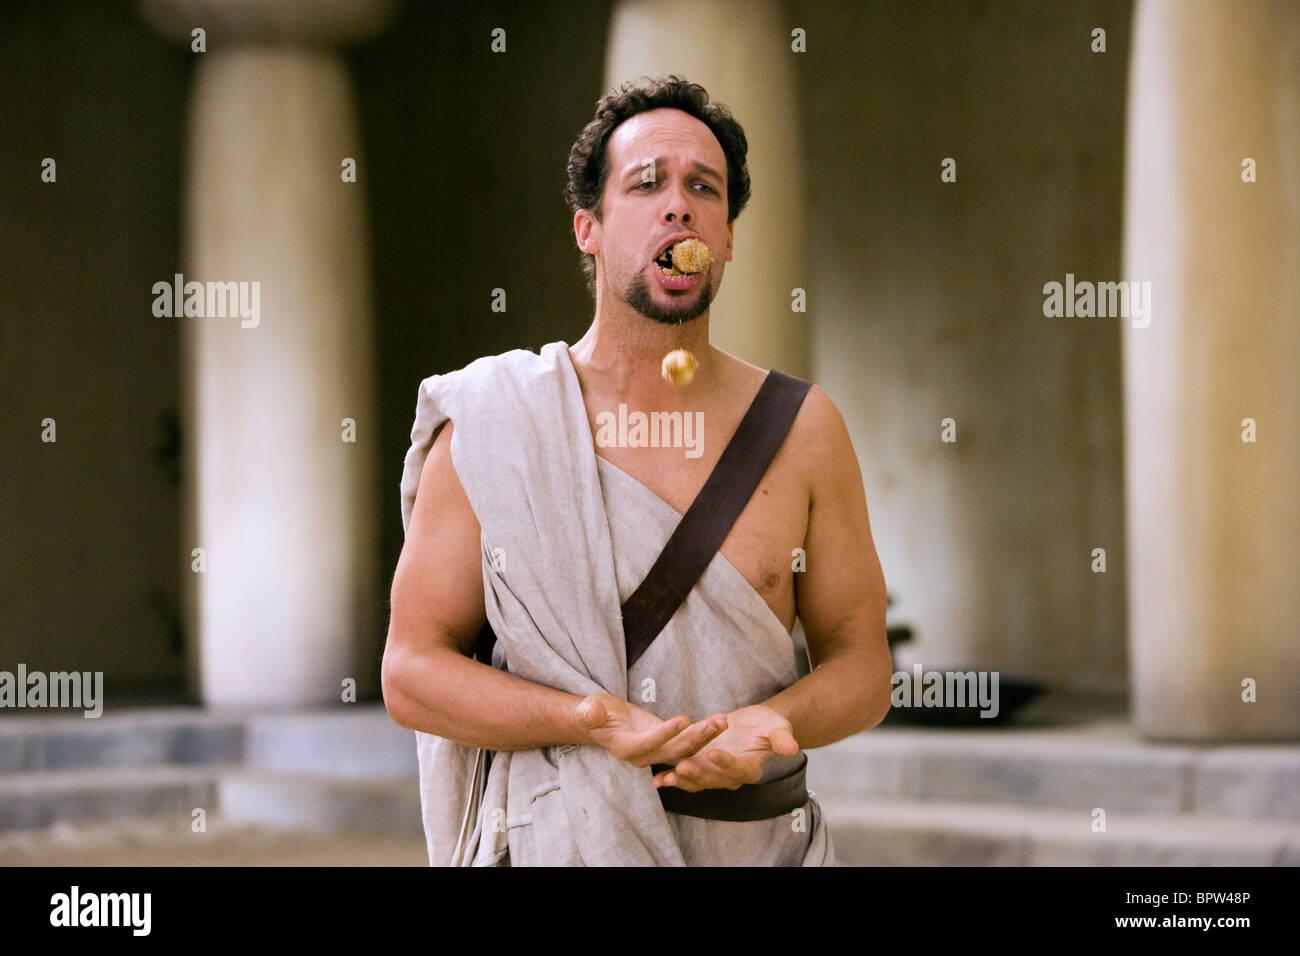 DIEDRICH BADER MEET THE SPARTANS (2008) - Stock Image